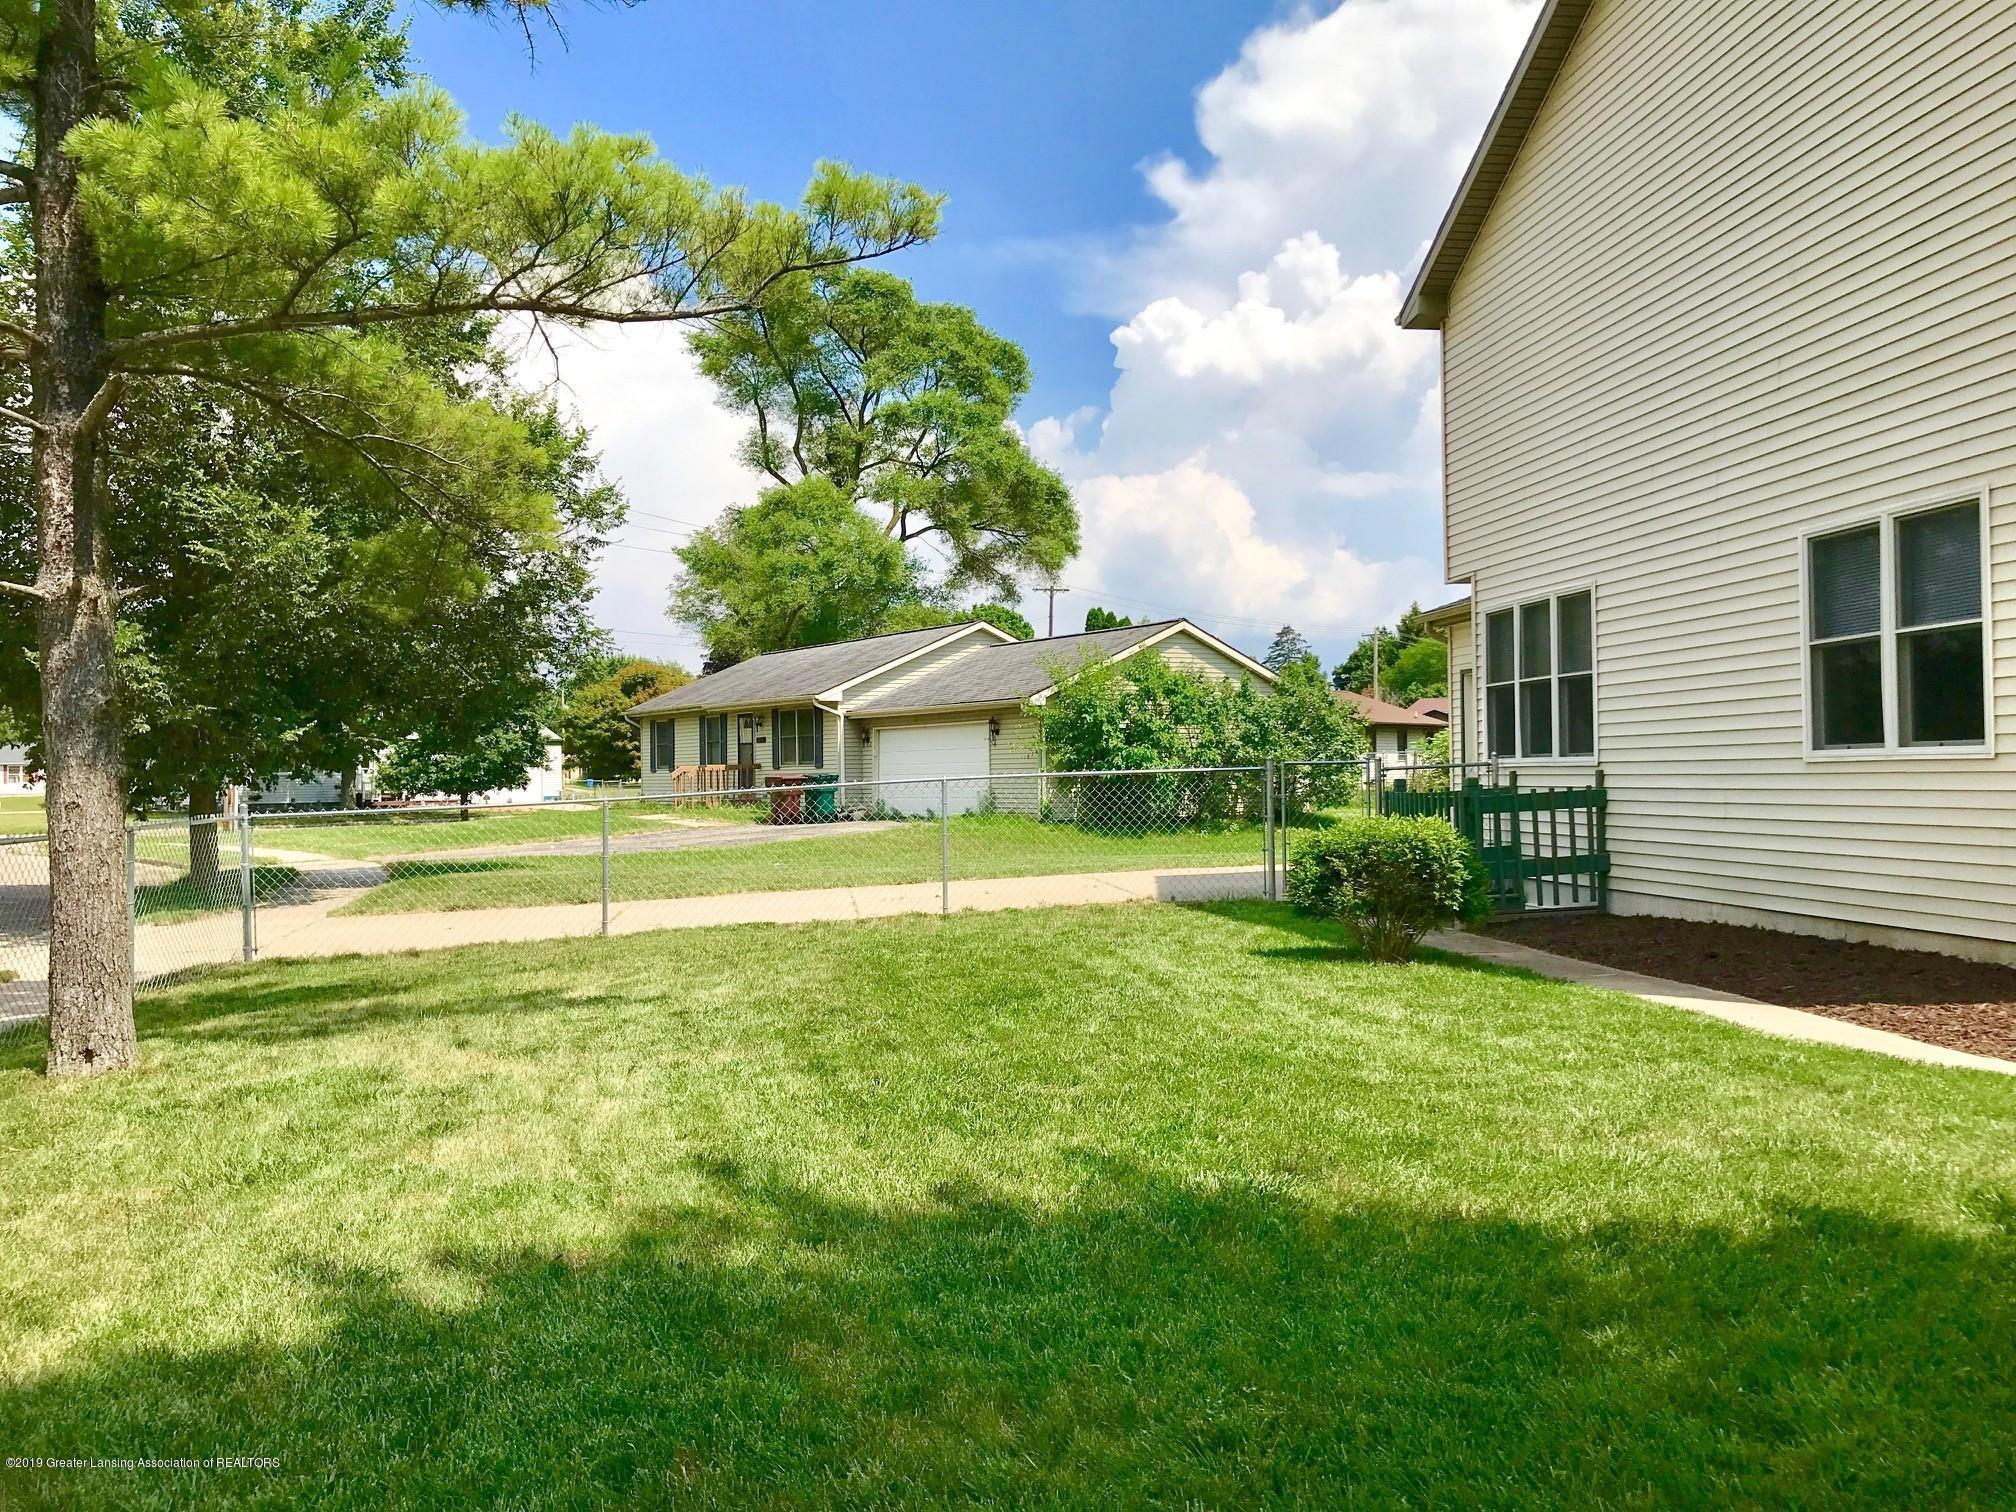 5703 Piper Ave - Yard - 26